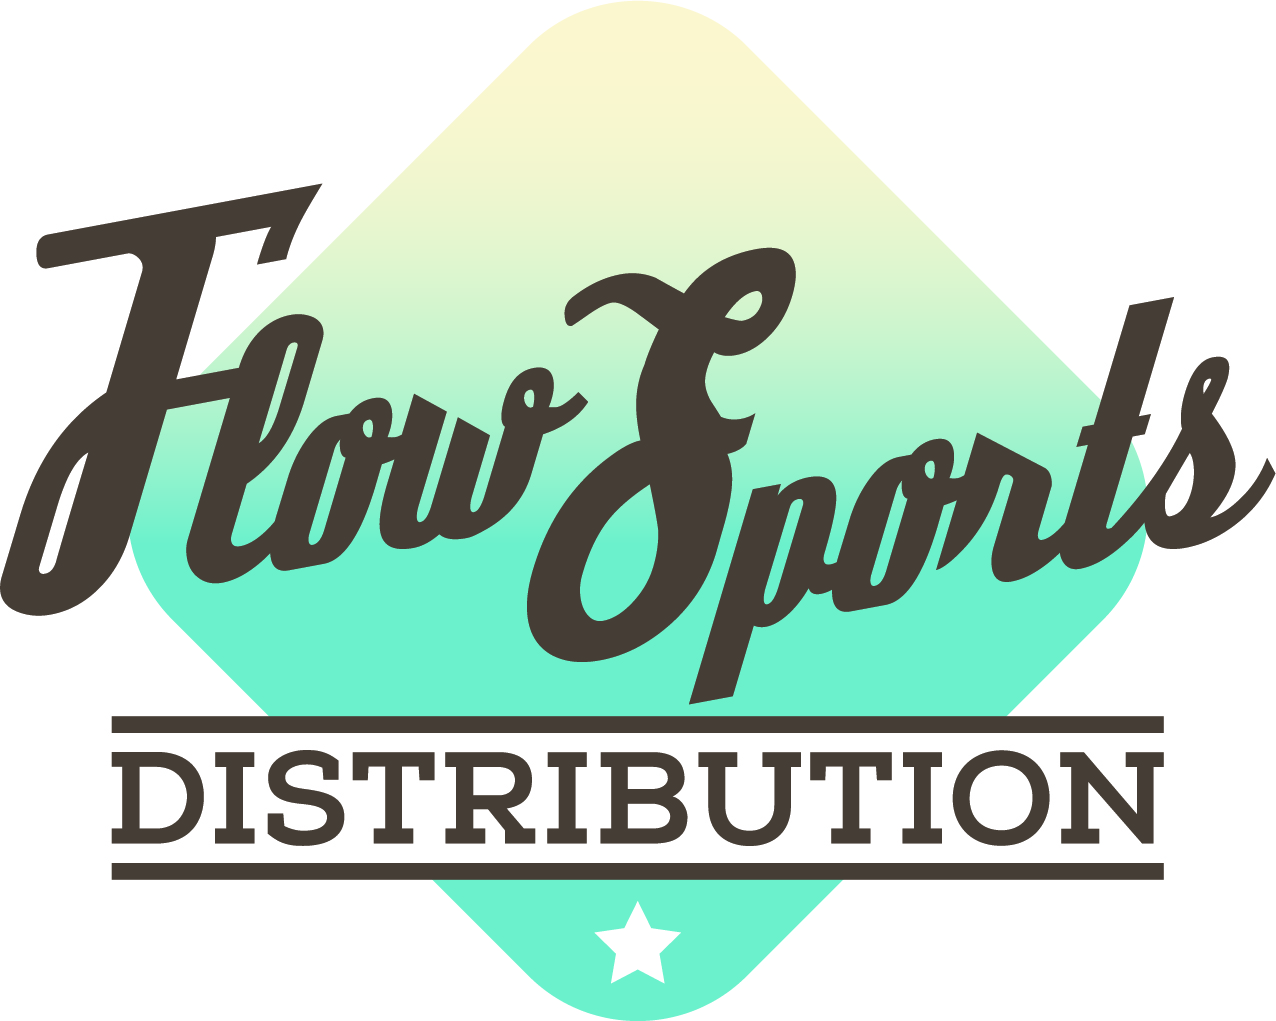 Artikelbestand van Flow Sports Distribution toegevoegd binnen CycleSoftware